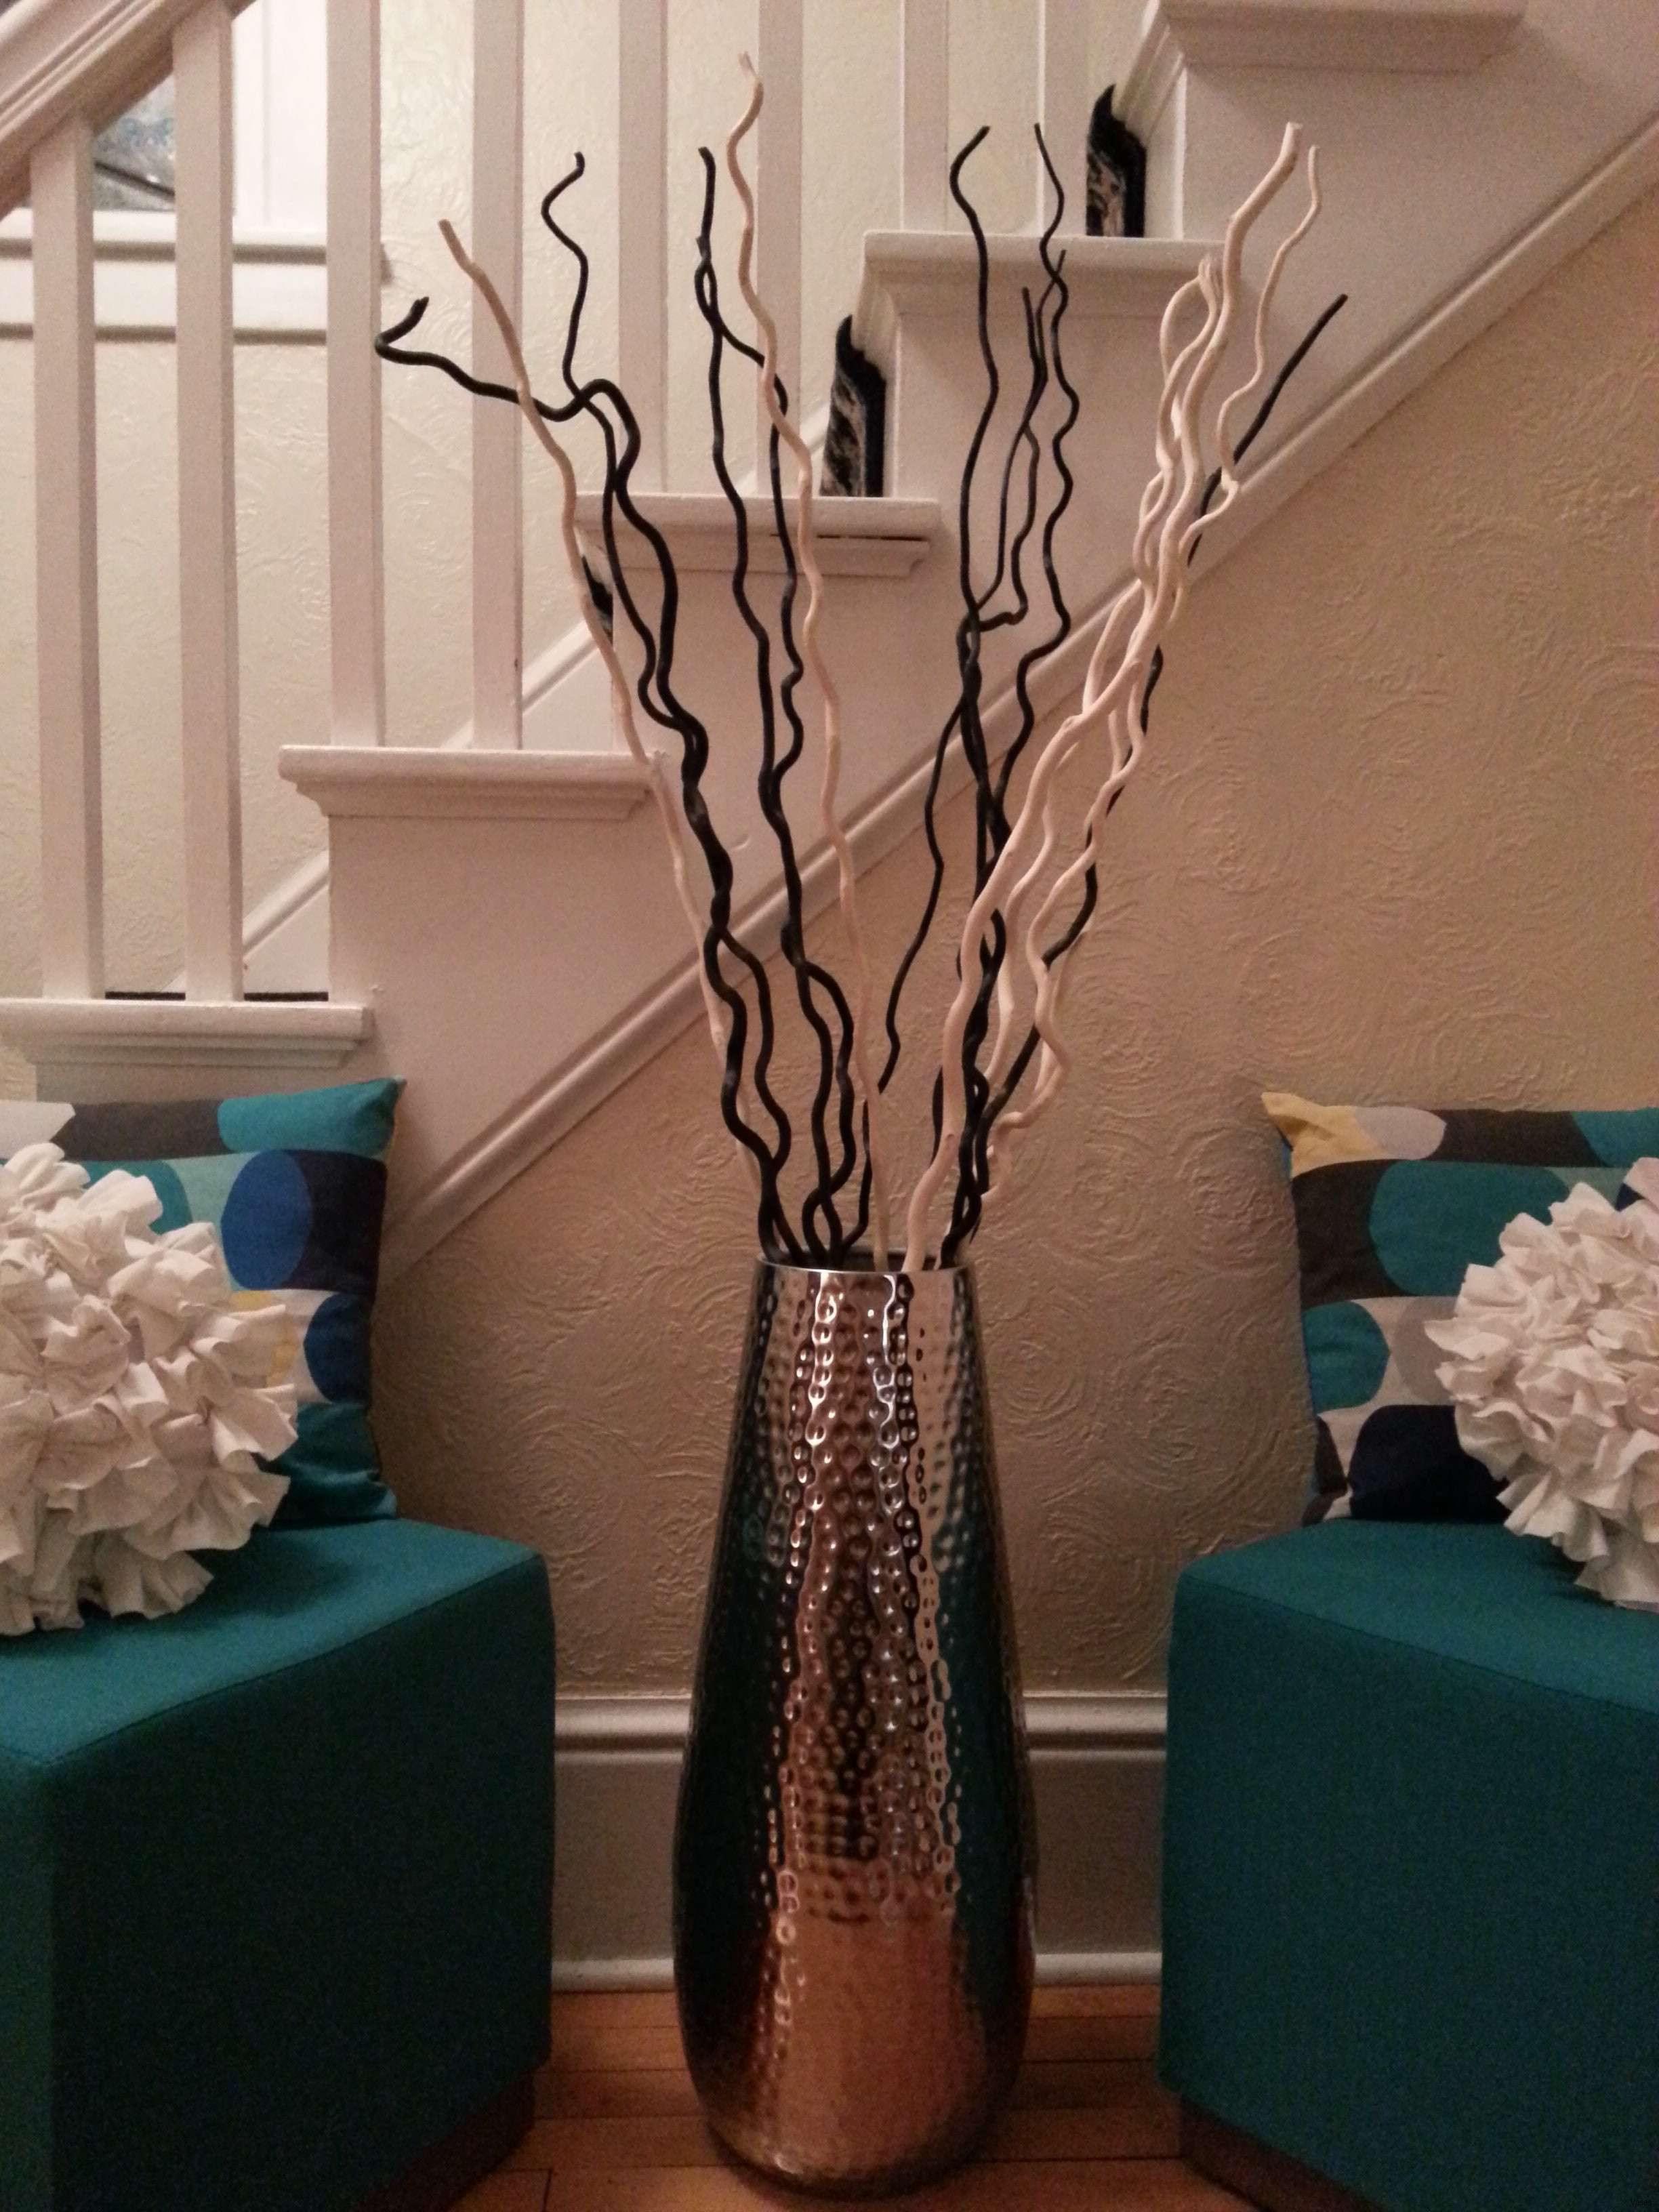 15 Best Vases For Centerpieces Dollar Store Decorative Vase Ideas